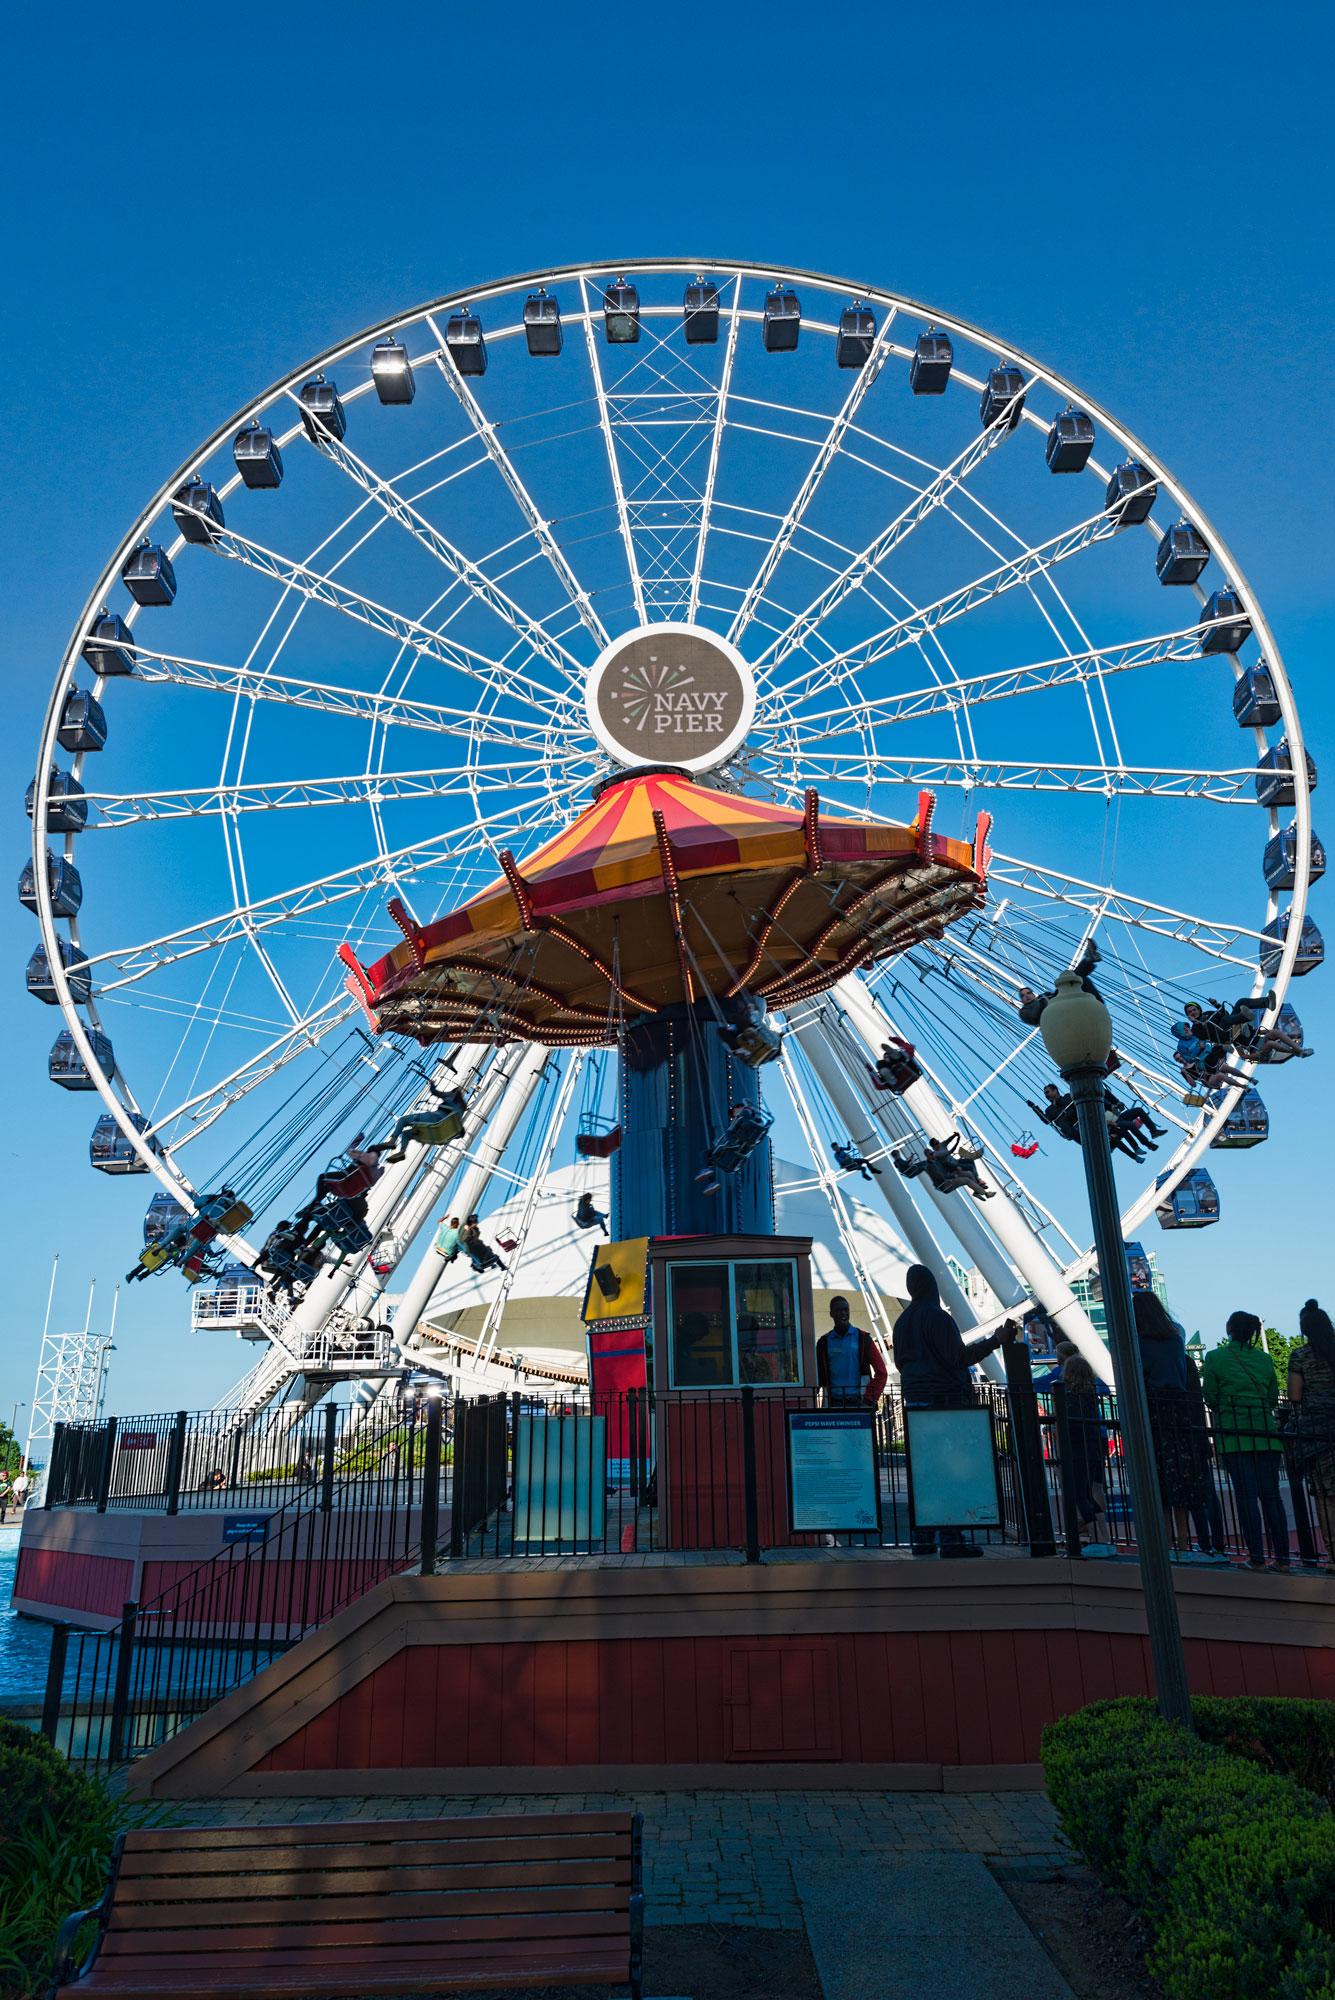 Centennial Wheel at Navy Pier